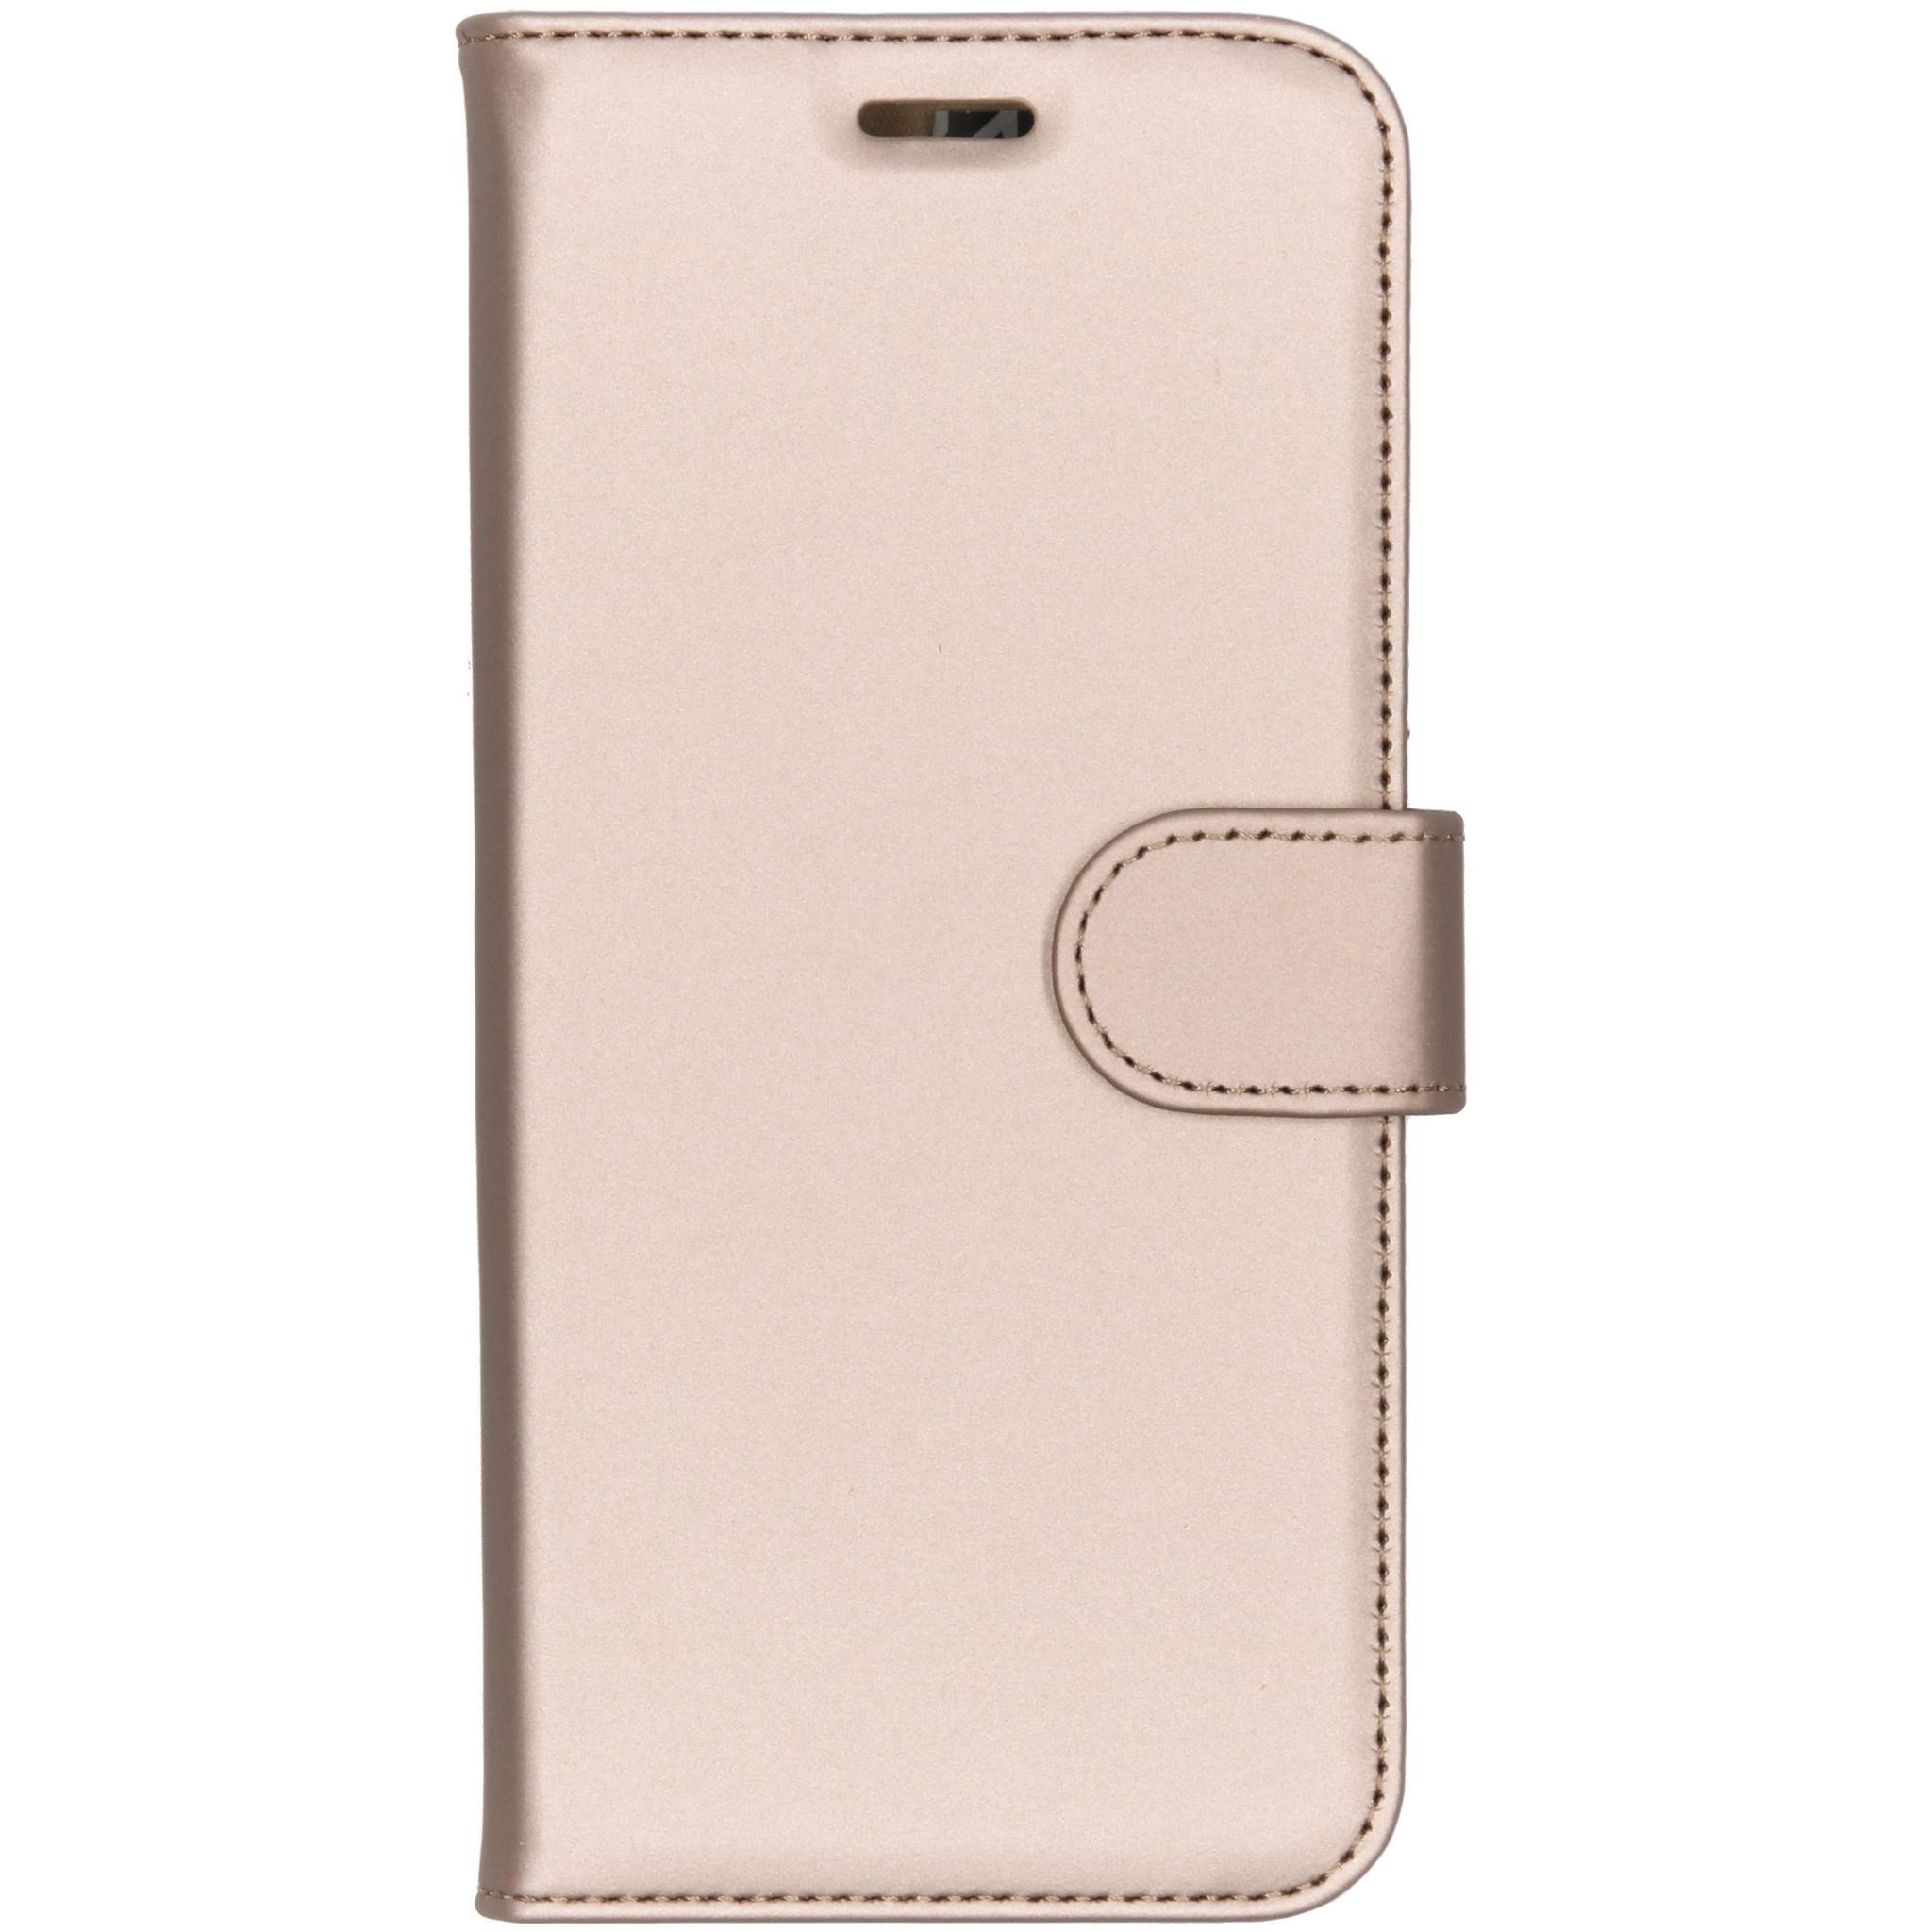 Accezz Wallet TPU Booklet Gold Motorola Moto E5 / G6 Play